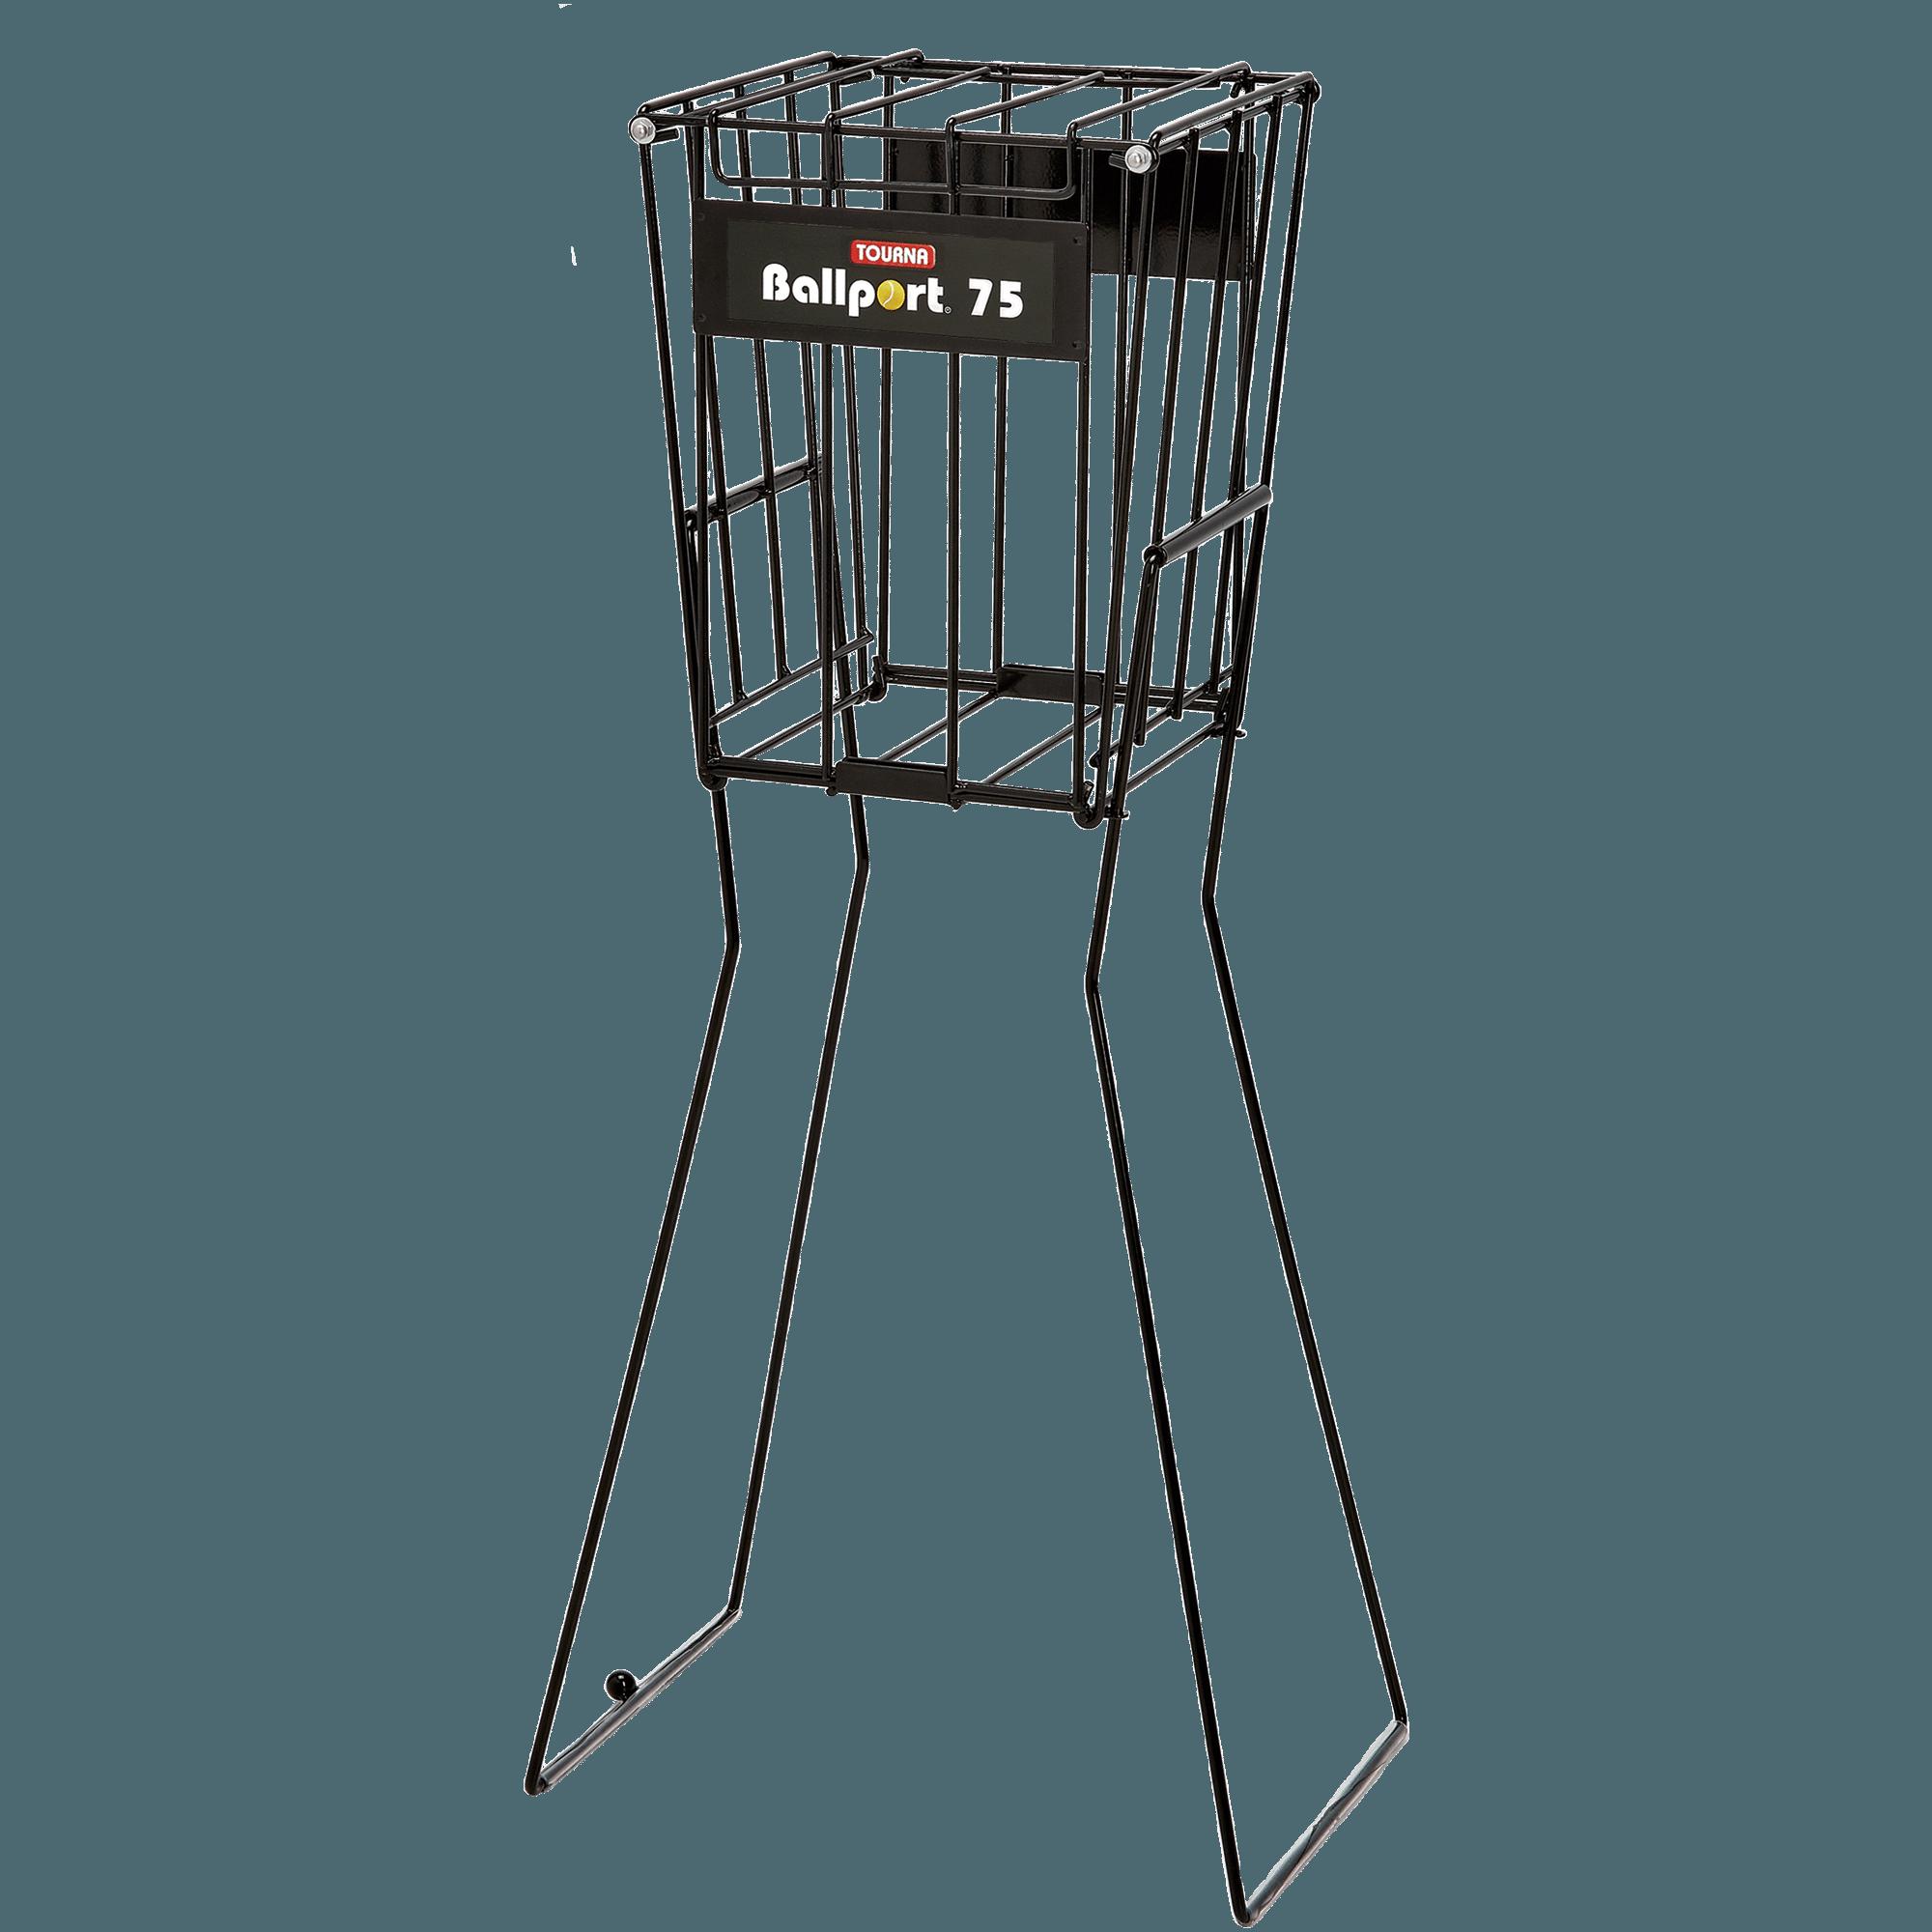 Classic Wire Ballport - Holds 75 Balls